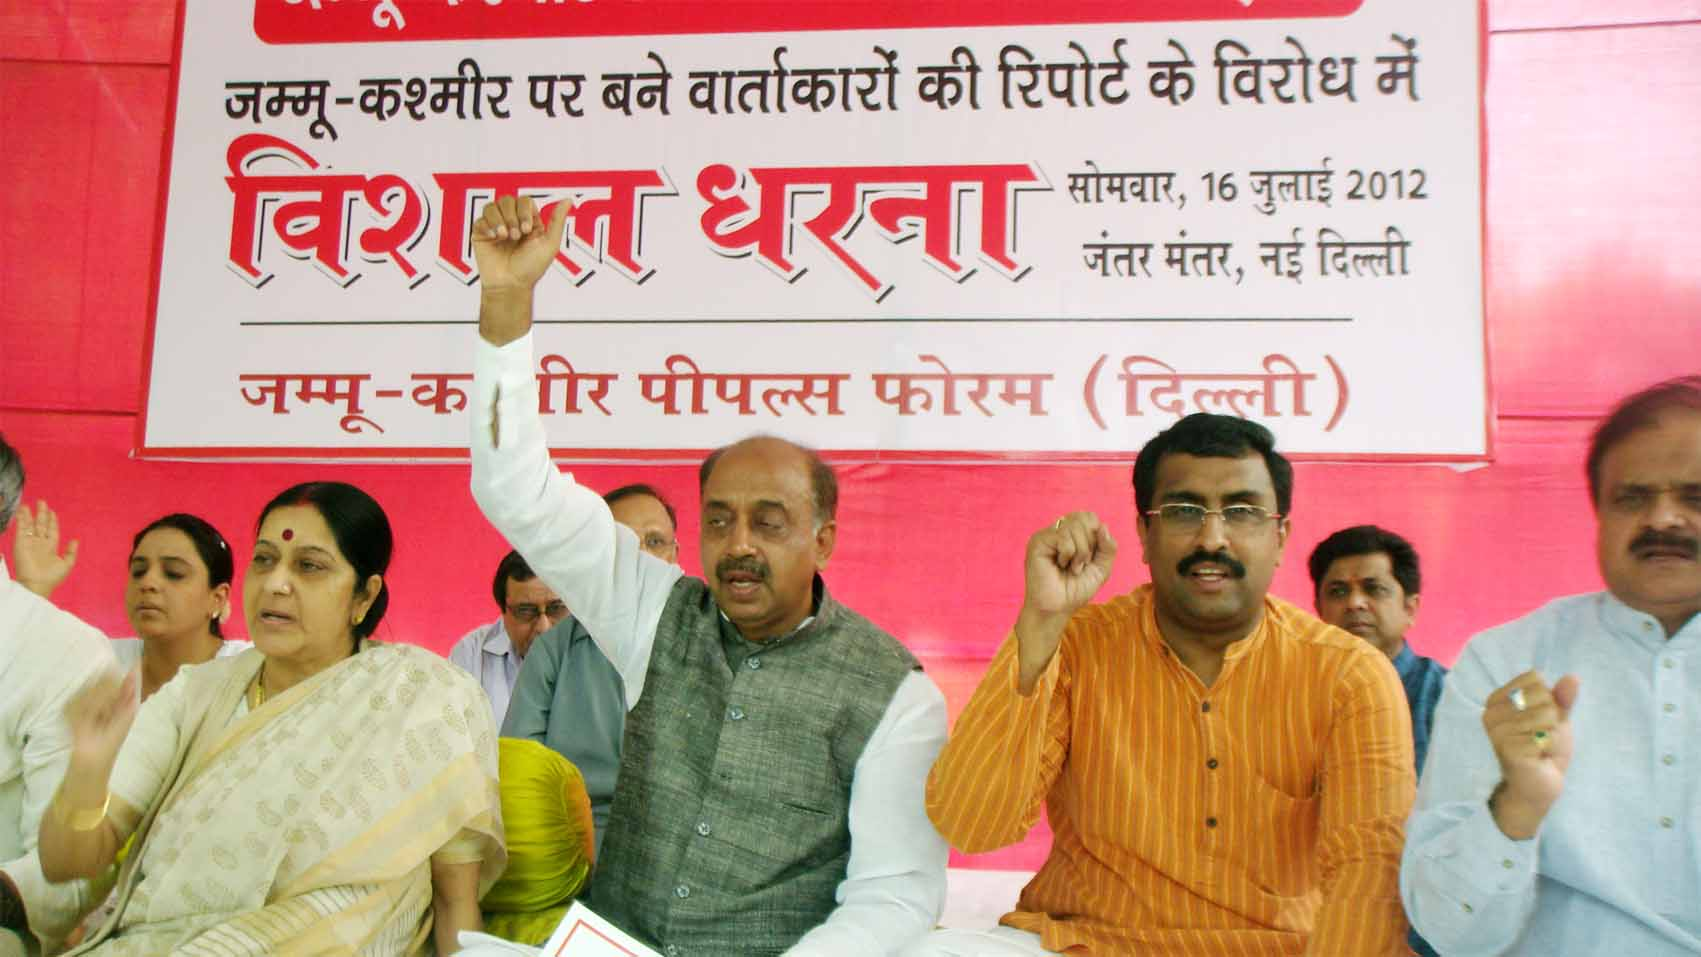 Ram Madhav, Sushma Swaraj slams JK report at Protest demonstration at New Delhi